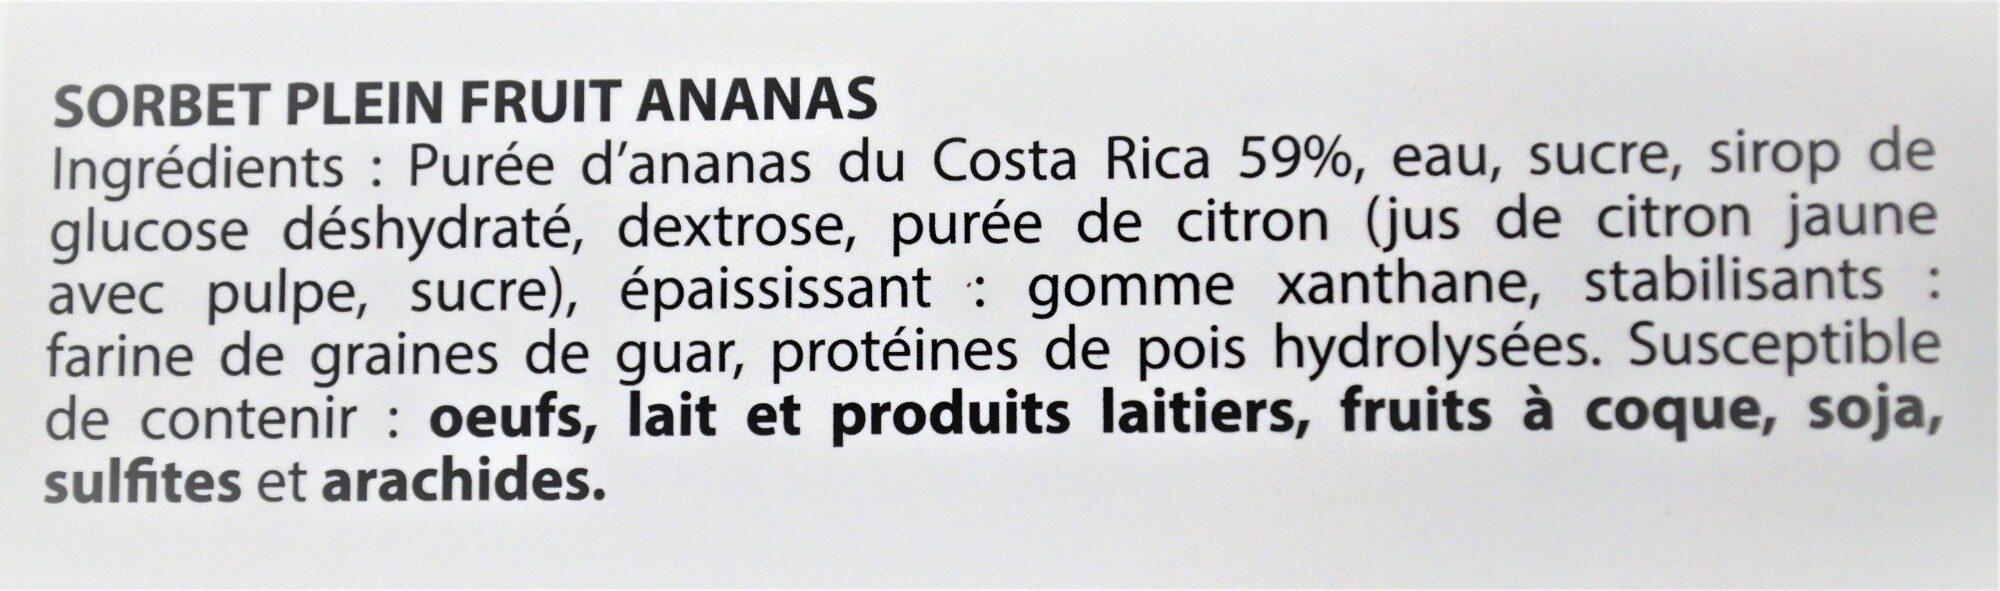 Sorbet plein fruit ANANAS, 59% de fruit - Ingrediënten